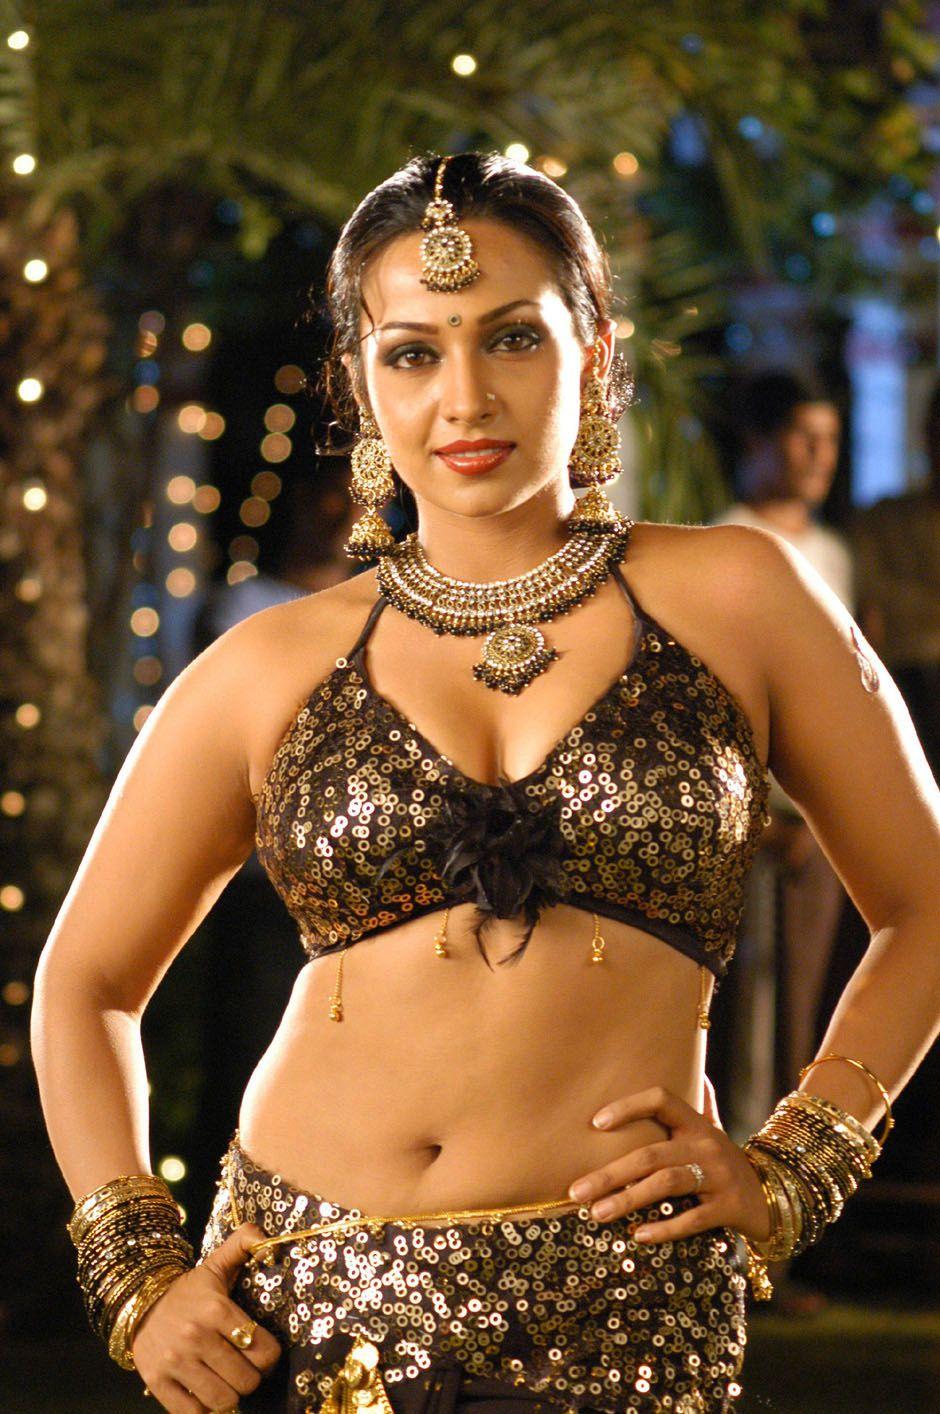 Mallu sex big girls nude sex stils confirm. And